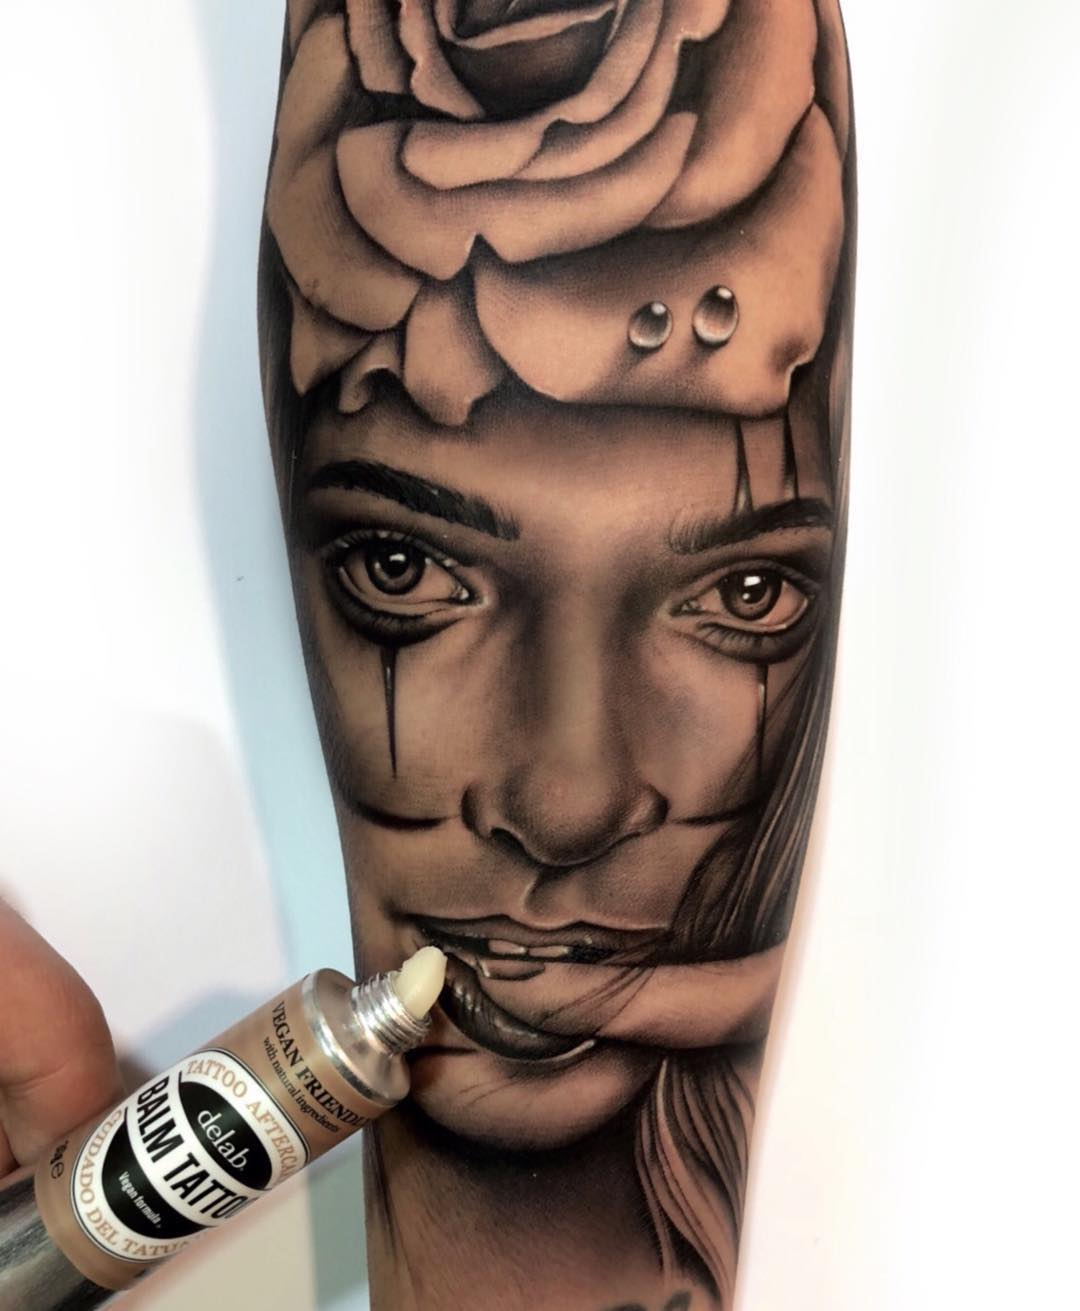 followforfollow,followmeciudadreal,ciudadreal,tomelloso,almagro,puertollano,tatuajesenpuertollano,tatuajesendaimiel,ciudadrealtattoo,ciudadrealtatuajes,tatuajesciudadreal,follow,ciudadrealtatuajes,puertollano,ciudadreal,tattoos,ciudadrealtattoo,tattooers,besttattooers,juantabasco,ciudadrealsetatua,ink,tatuajes,realismo,realistictattoo,ciudadrealtattoo,tatuajesenpuertollano,traditionaltattoos,castillalamancha,ink,tattooart,thebestspaintattooartists,maxonmotortattoo,erasmusciudadreal,daimiel,blackandgreytattoo,daimiel